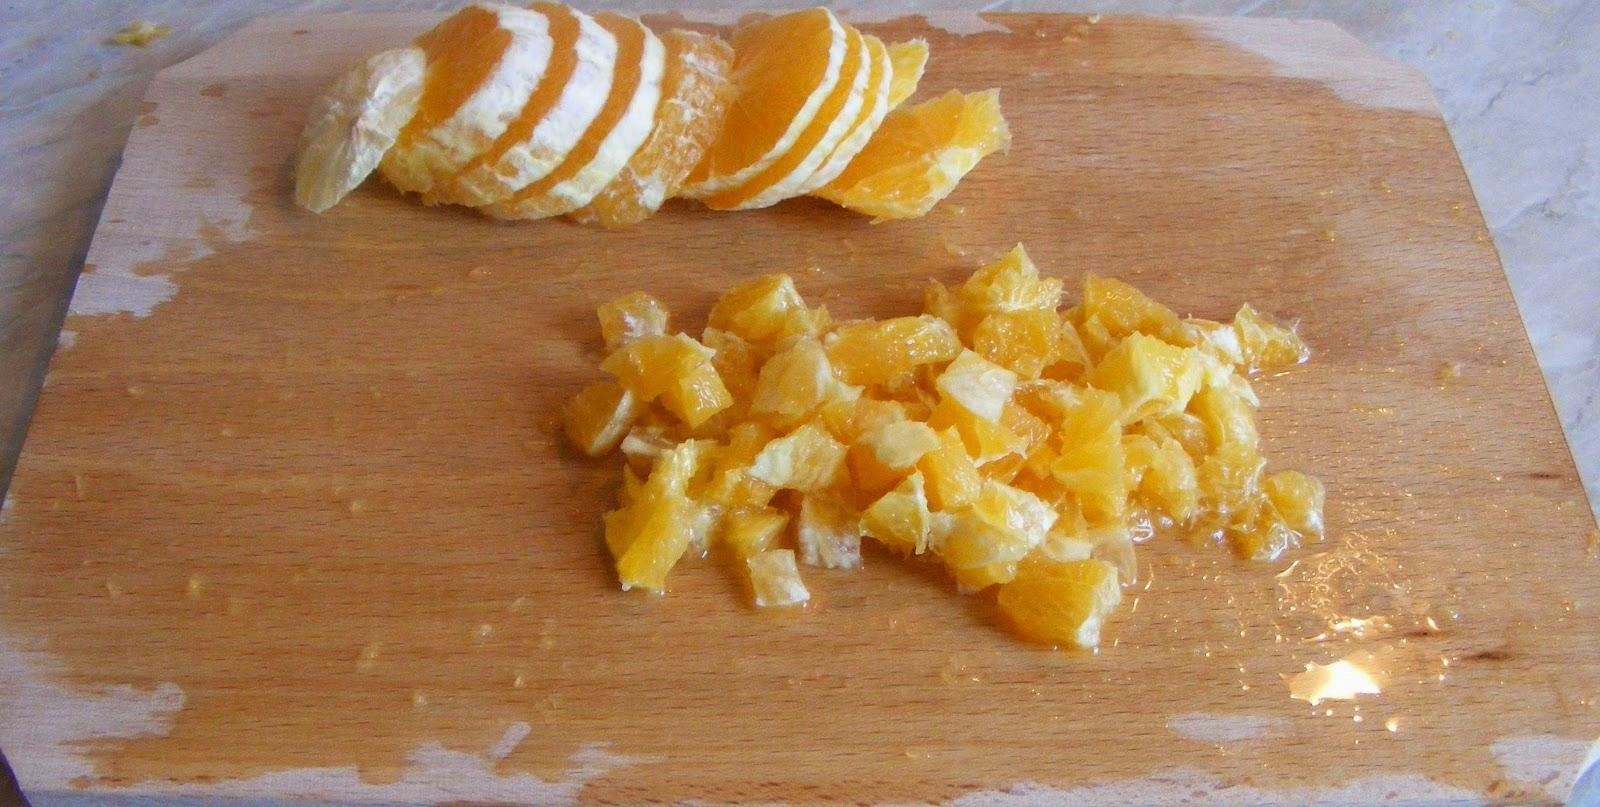 preparare dulceata, preparare dulceata de portocale de casa, cum se prepara dulceata de portocale, cum facem dulceata de portocale, retete si preparate culinare gemuri si dulceturi de casa pentru iarna, retete cu fructe, reteta cu portocale,